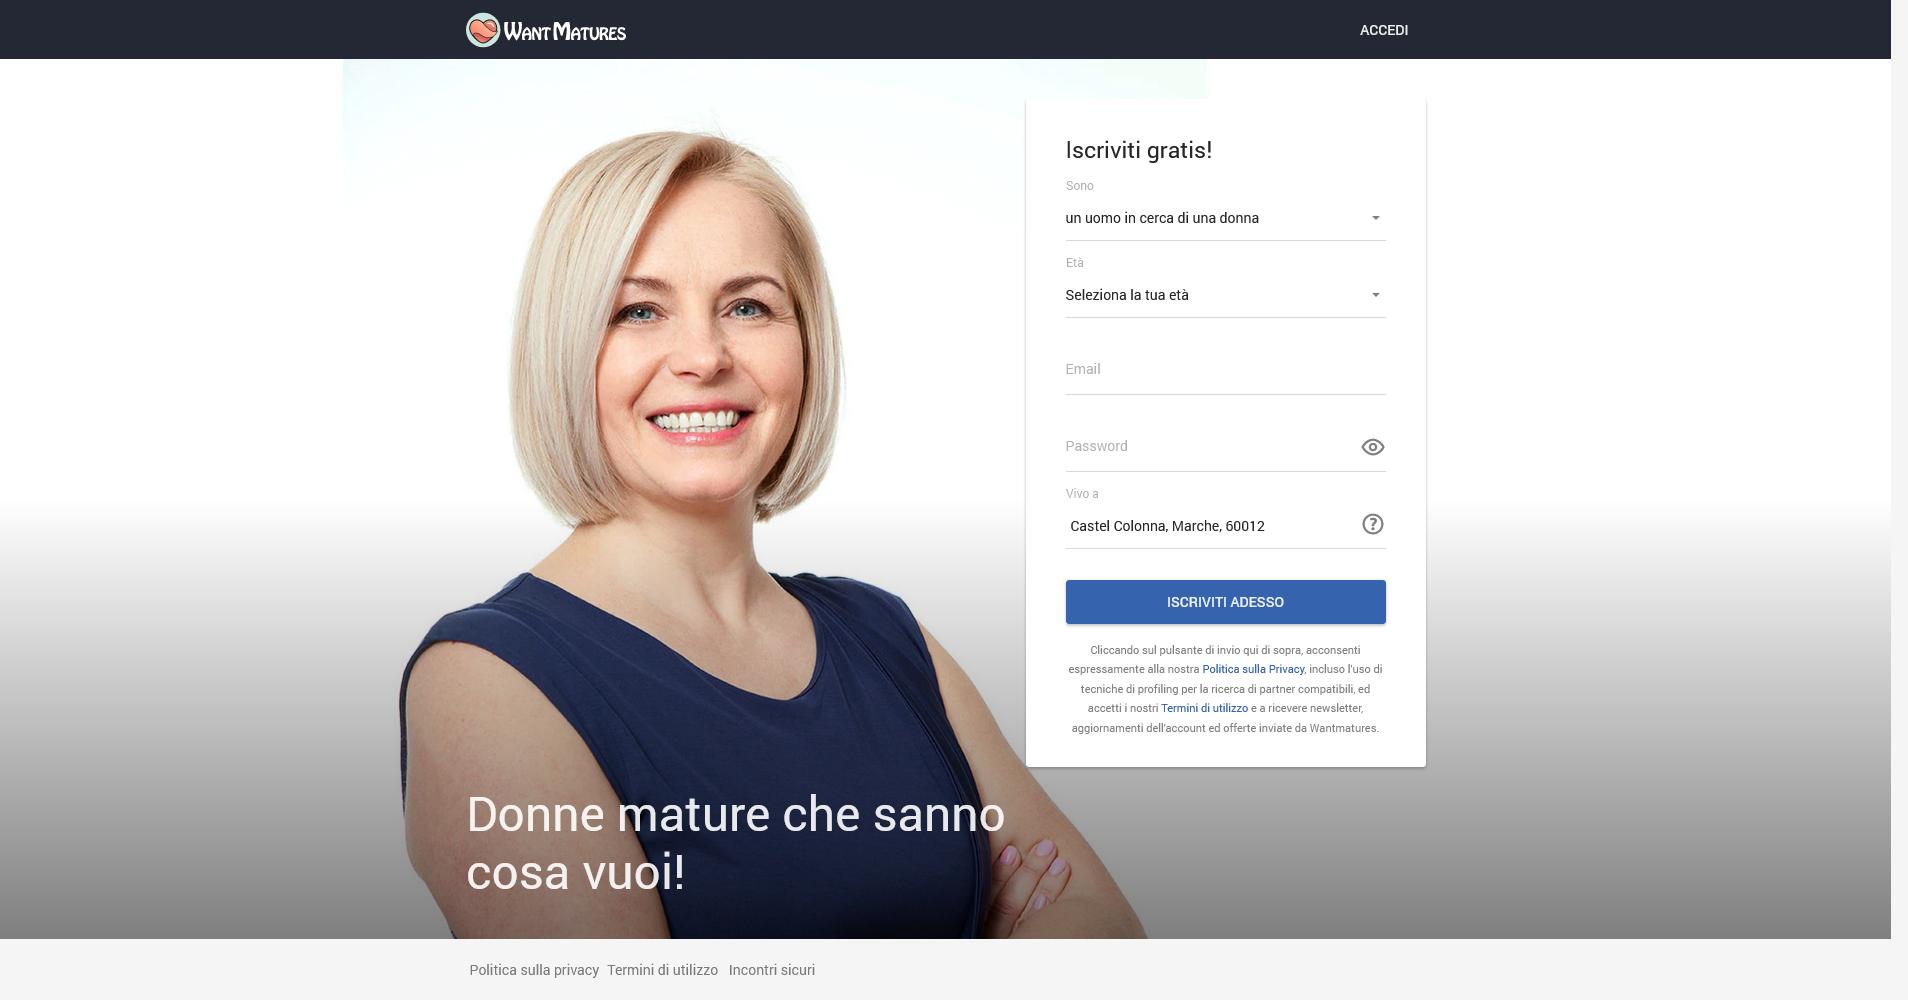 wantmatures_com